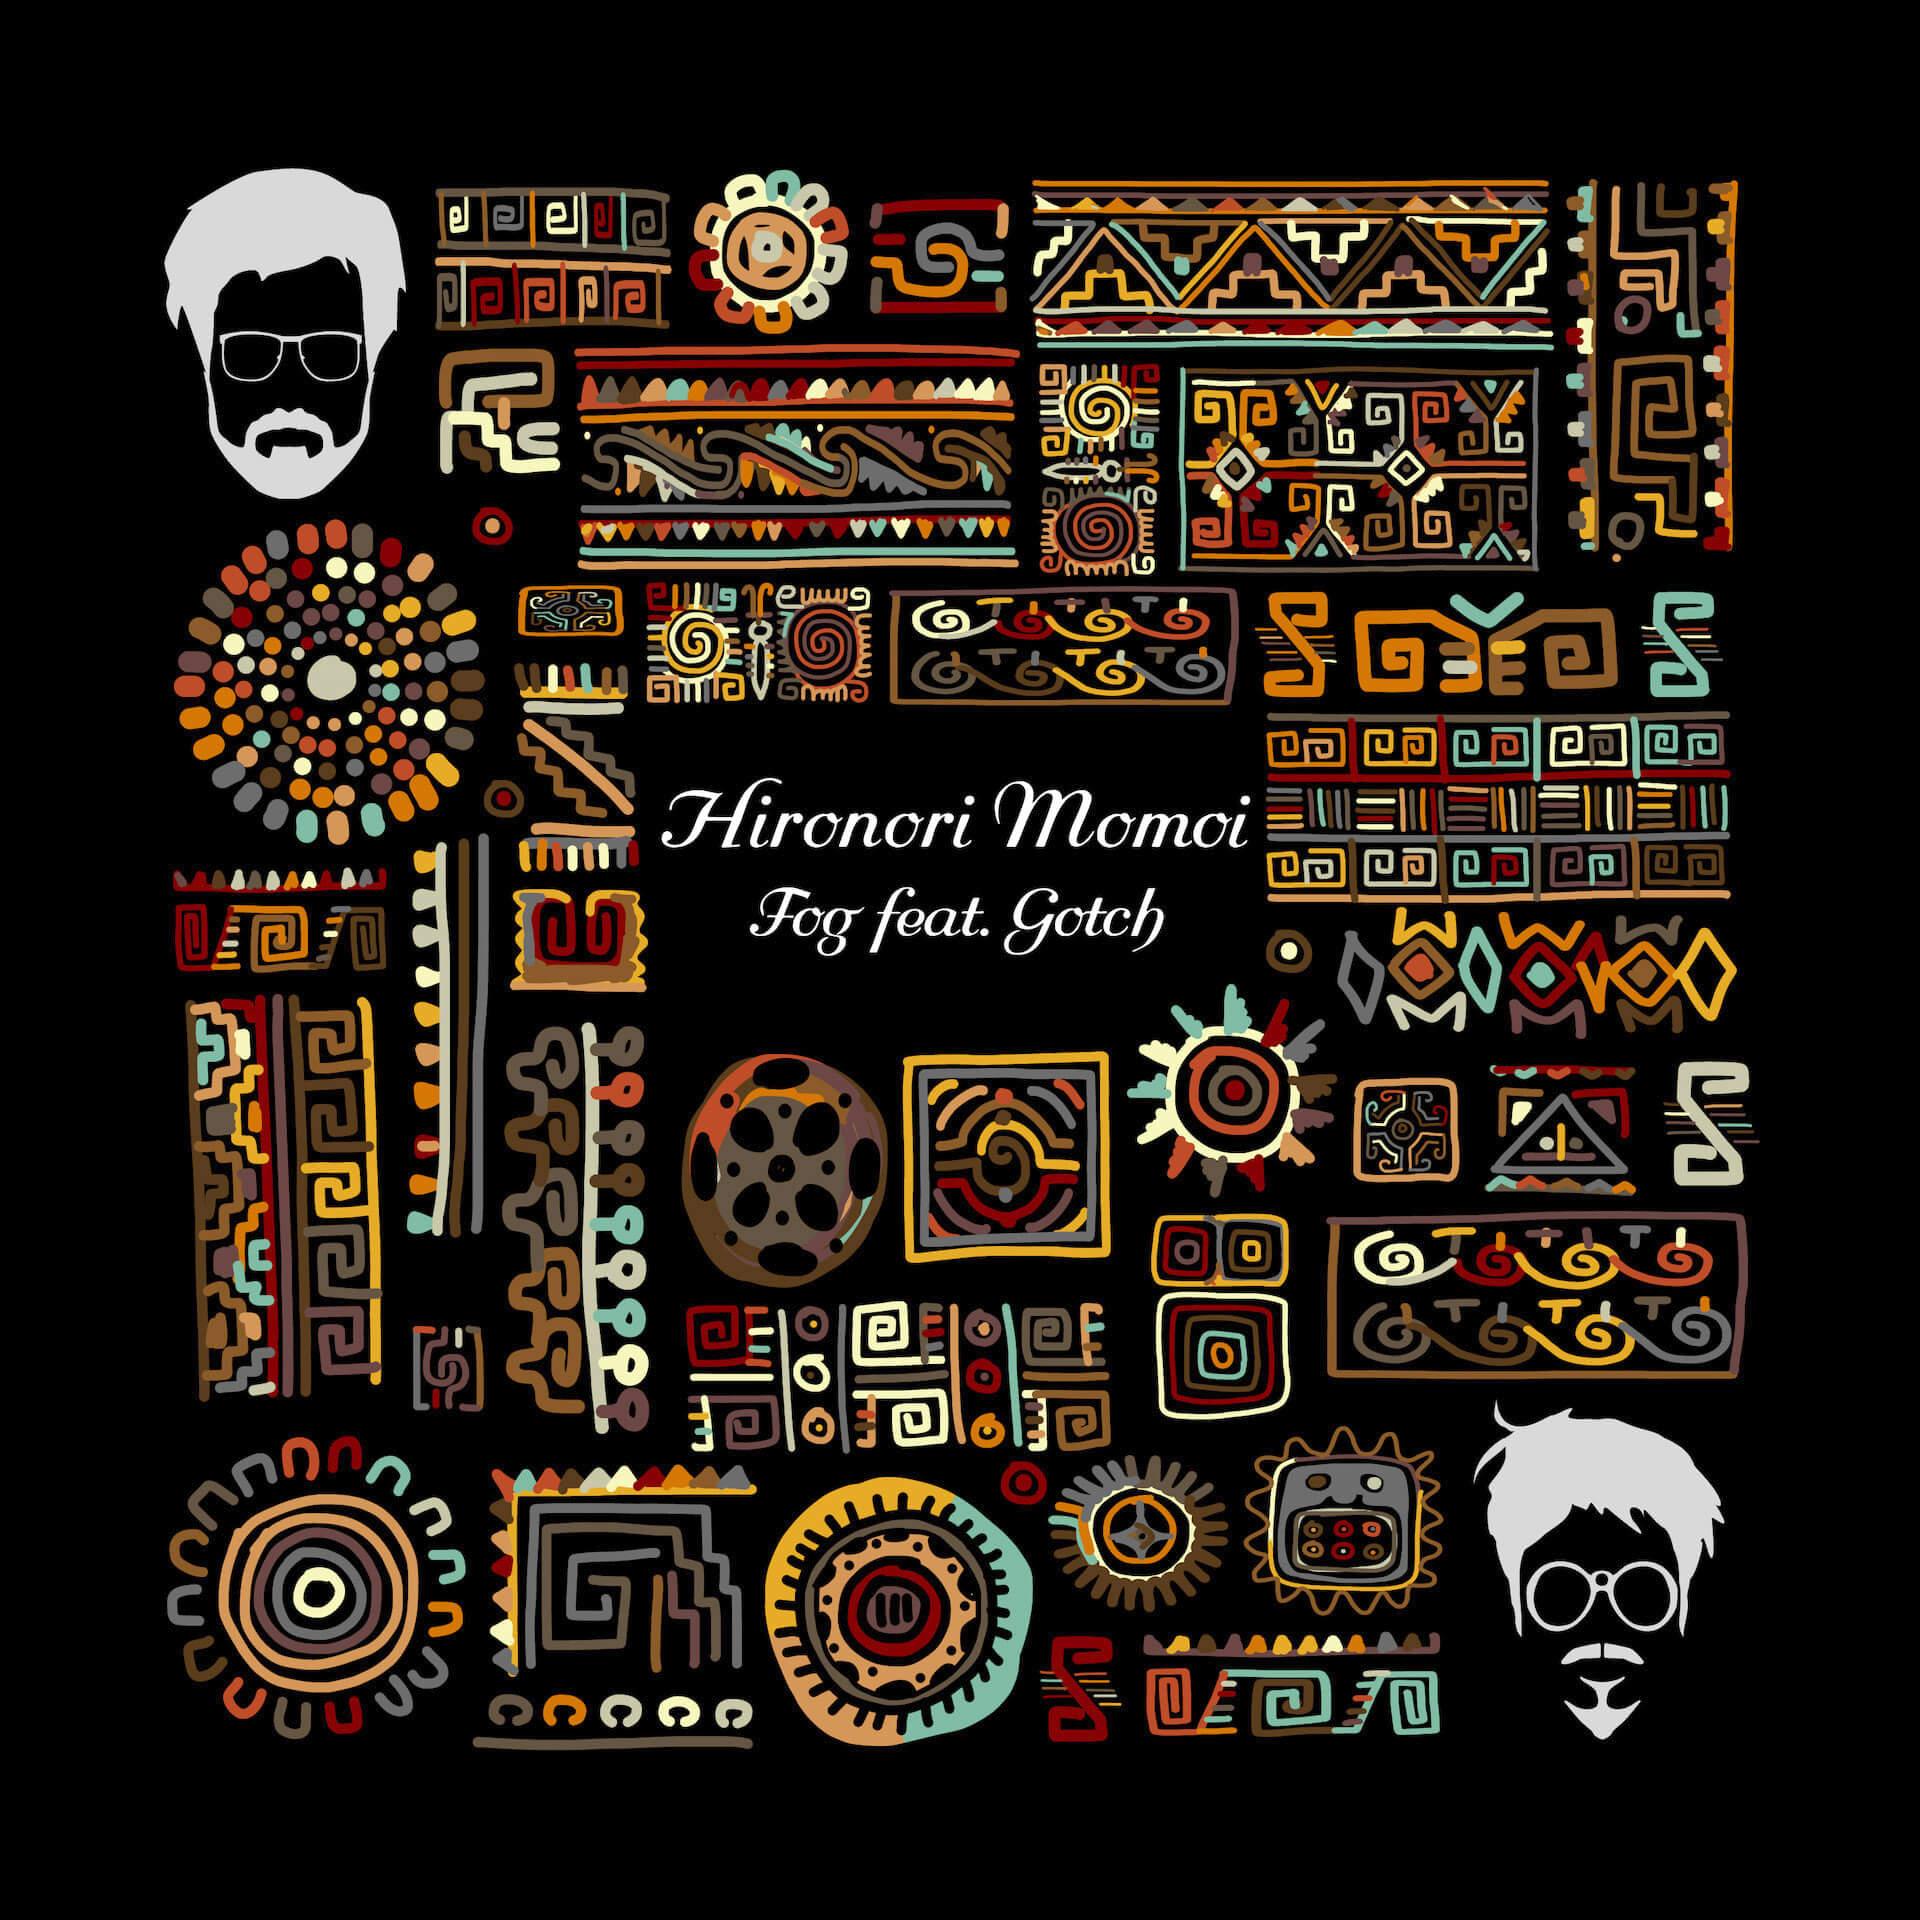 "Jazzの未来を鳴らすドラマーHironori MomoiがGotchを迎えた新曲""Fog feat.Gotch""をリリース!2ndアルバム詳細も発表 music210608_hironarimomoi2"